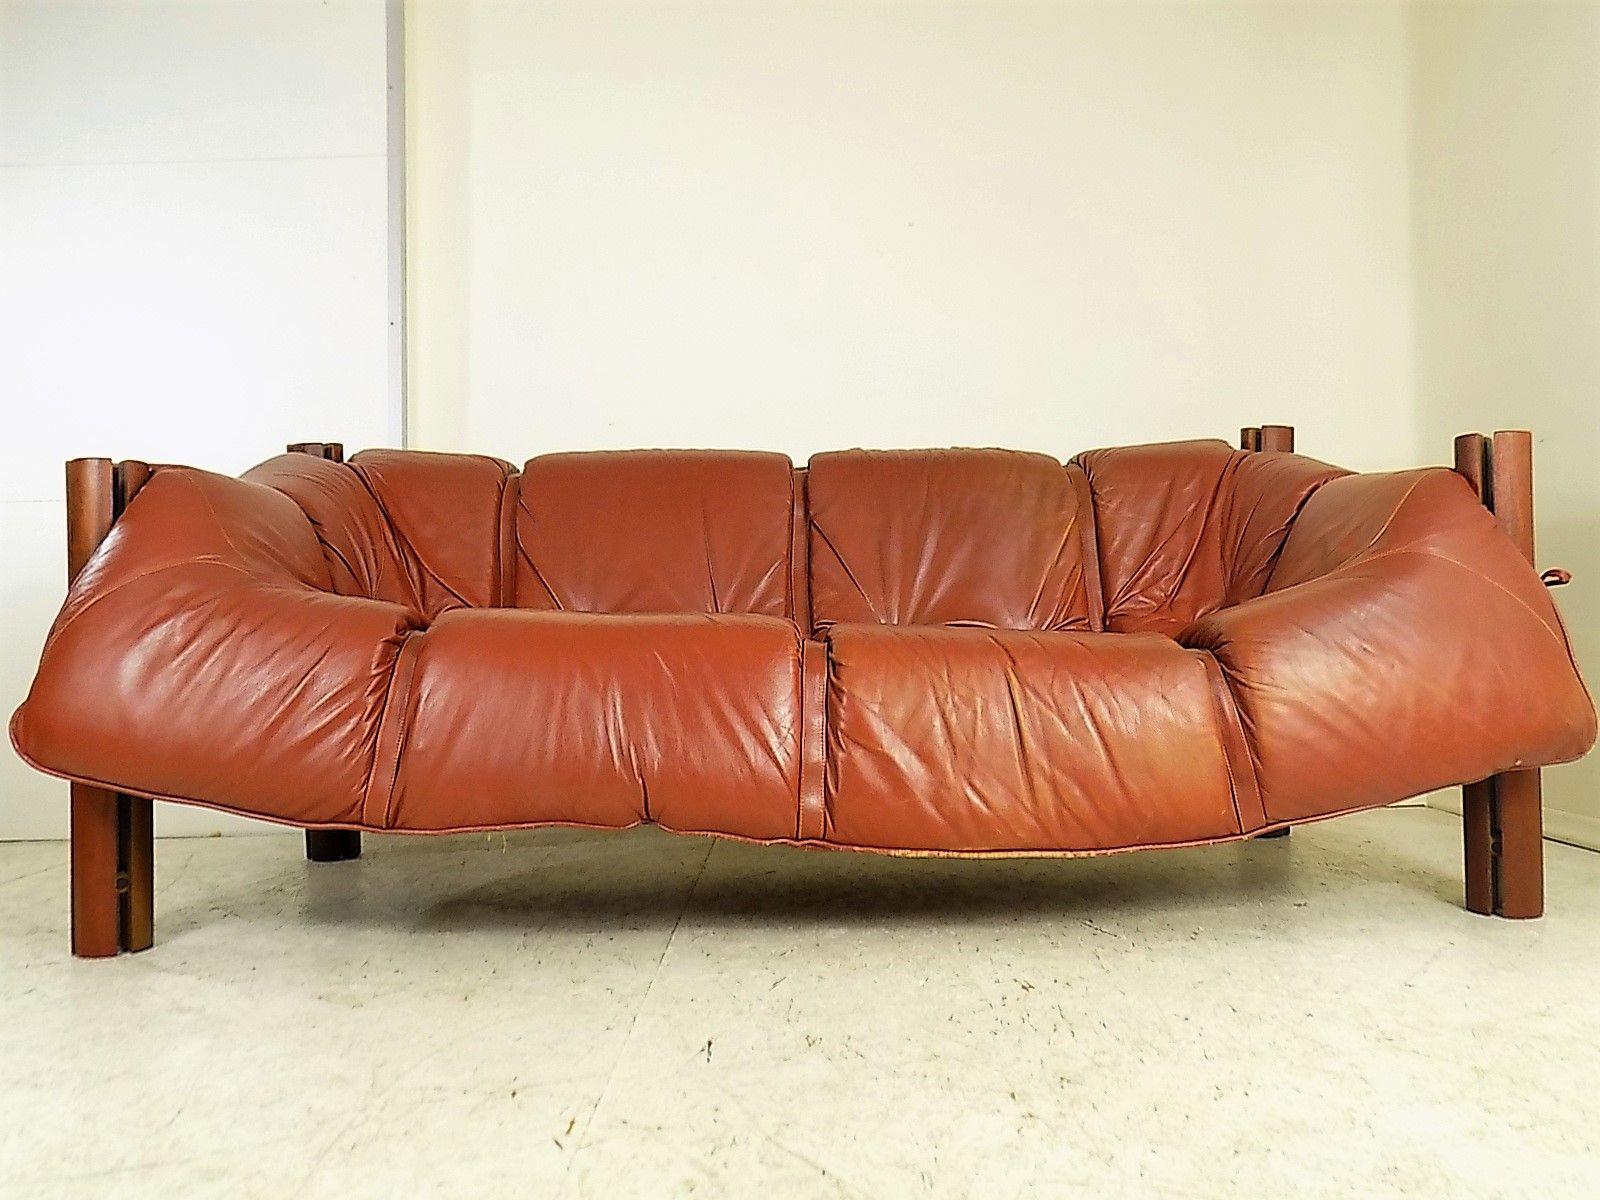 sofa 3 sitzer leder stunning sofa sitzer leder elegante mbel wohnzimmer und haus mit sofa. Black Bedroom Furniture Sets. Home Design Ideas